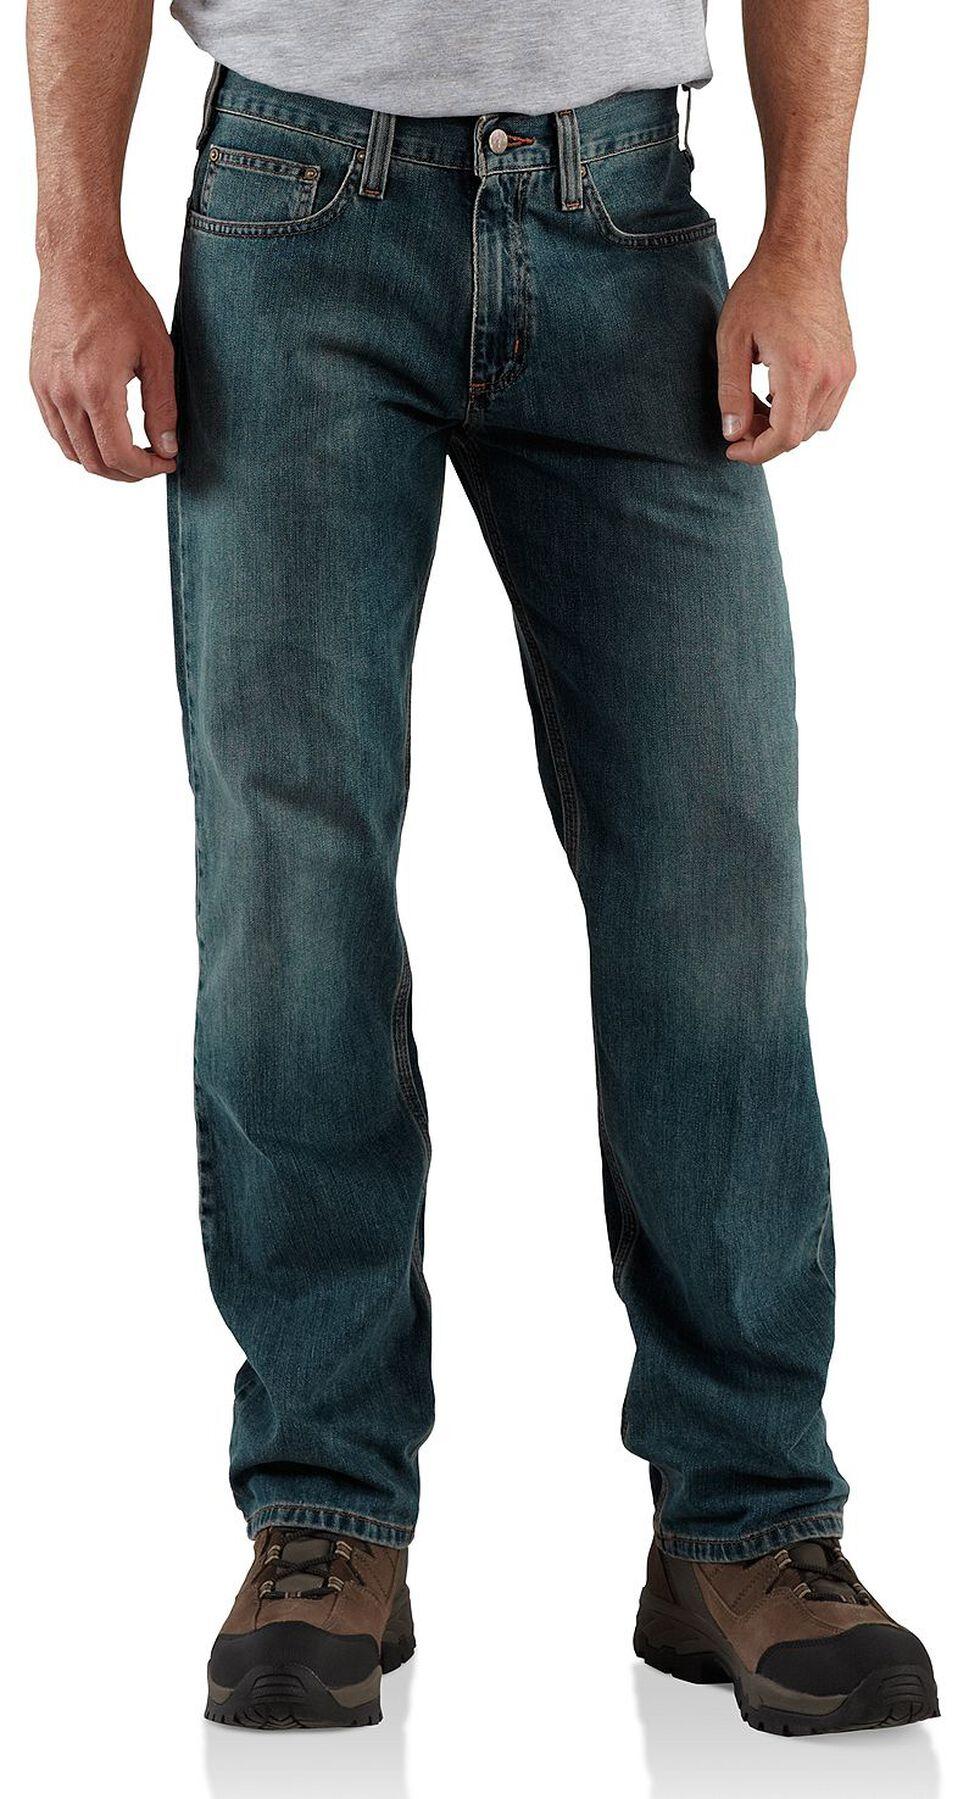 Carhartt Relaxed Straight Leg Jeans, Dark Blue, hi-res